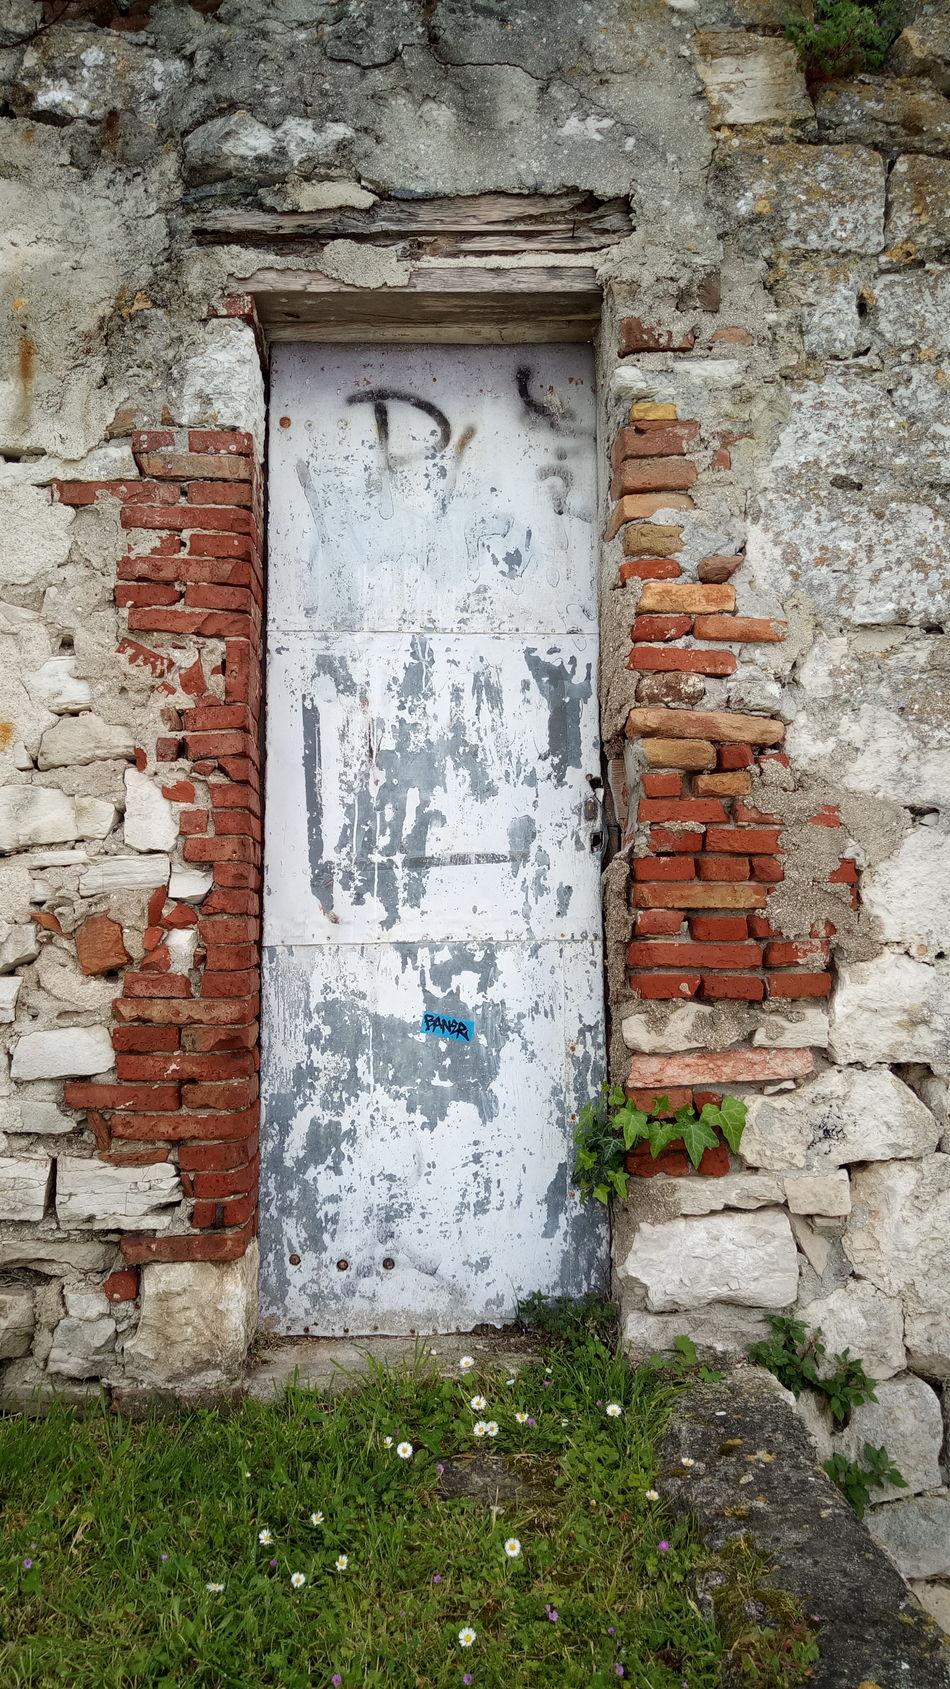 Built Structure Building Exterior Old House Wall - Building Feature Door Bricks Stones